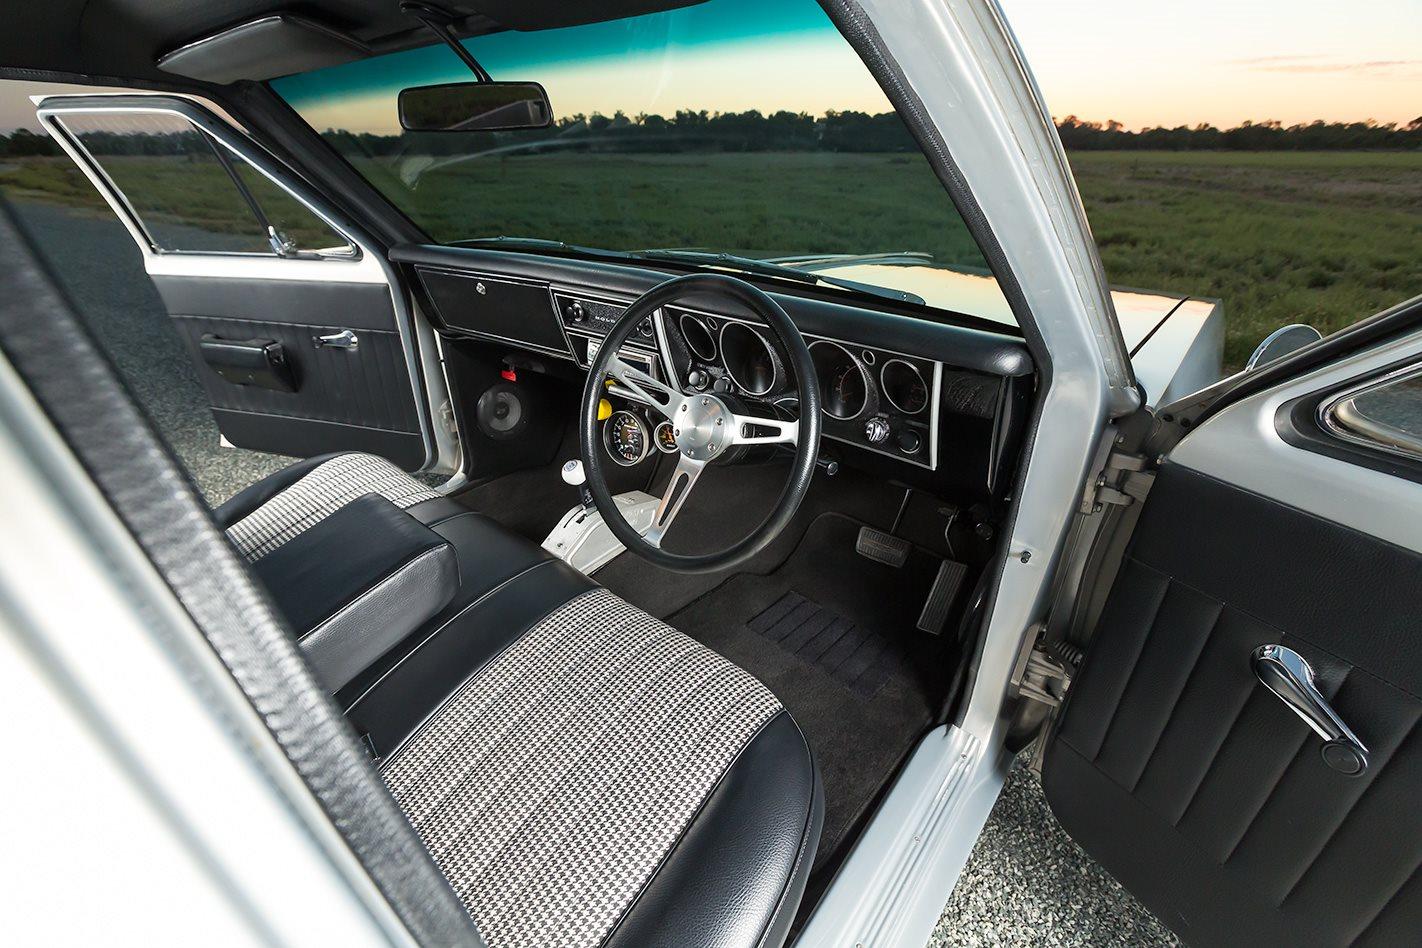 Shane-Willmott-FOOLSGOLD-1JZ-Holden-HT-Ute-Sleeper-interior-drivers-side-view